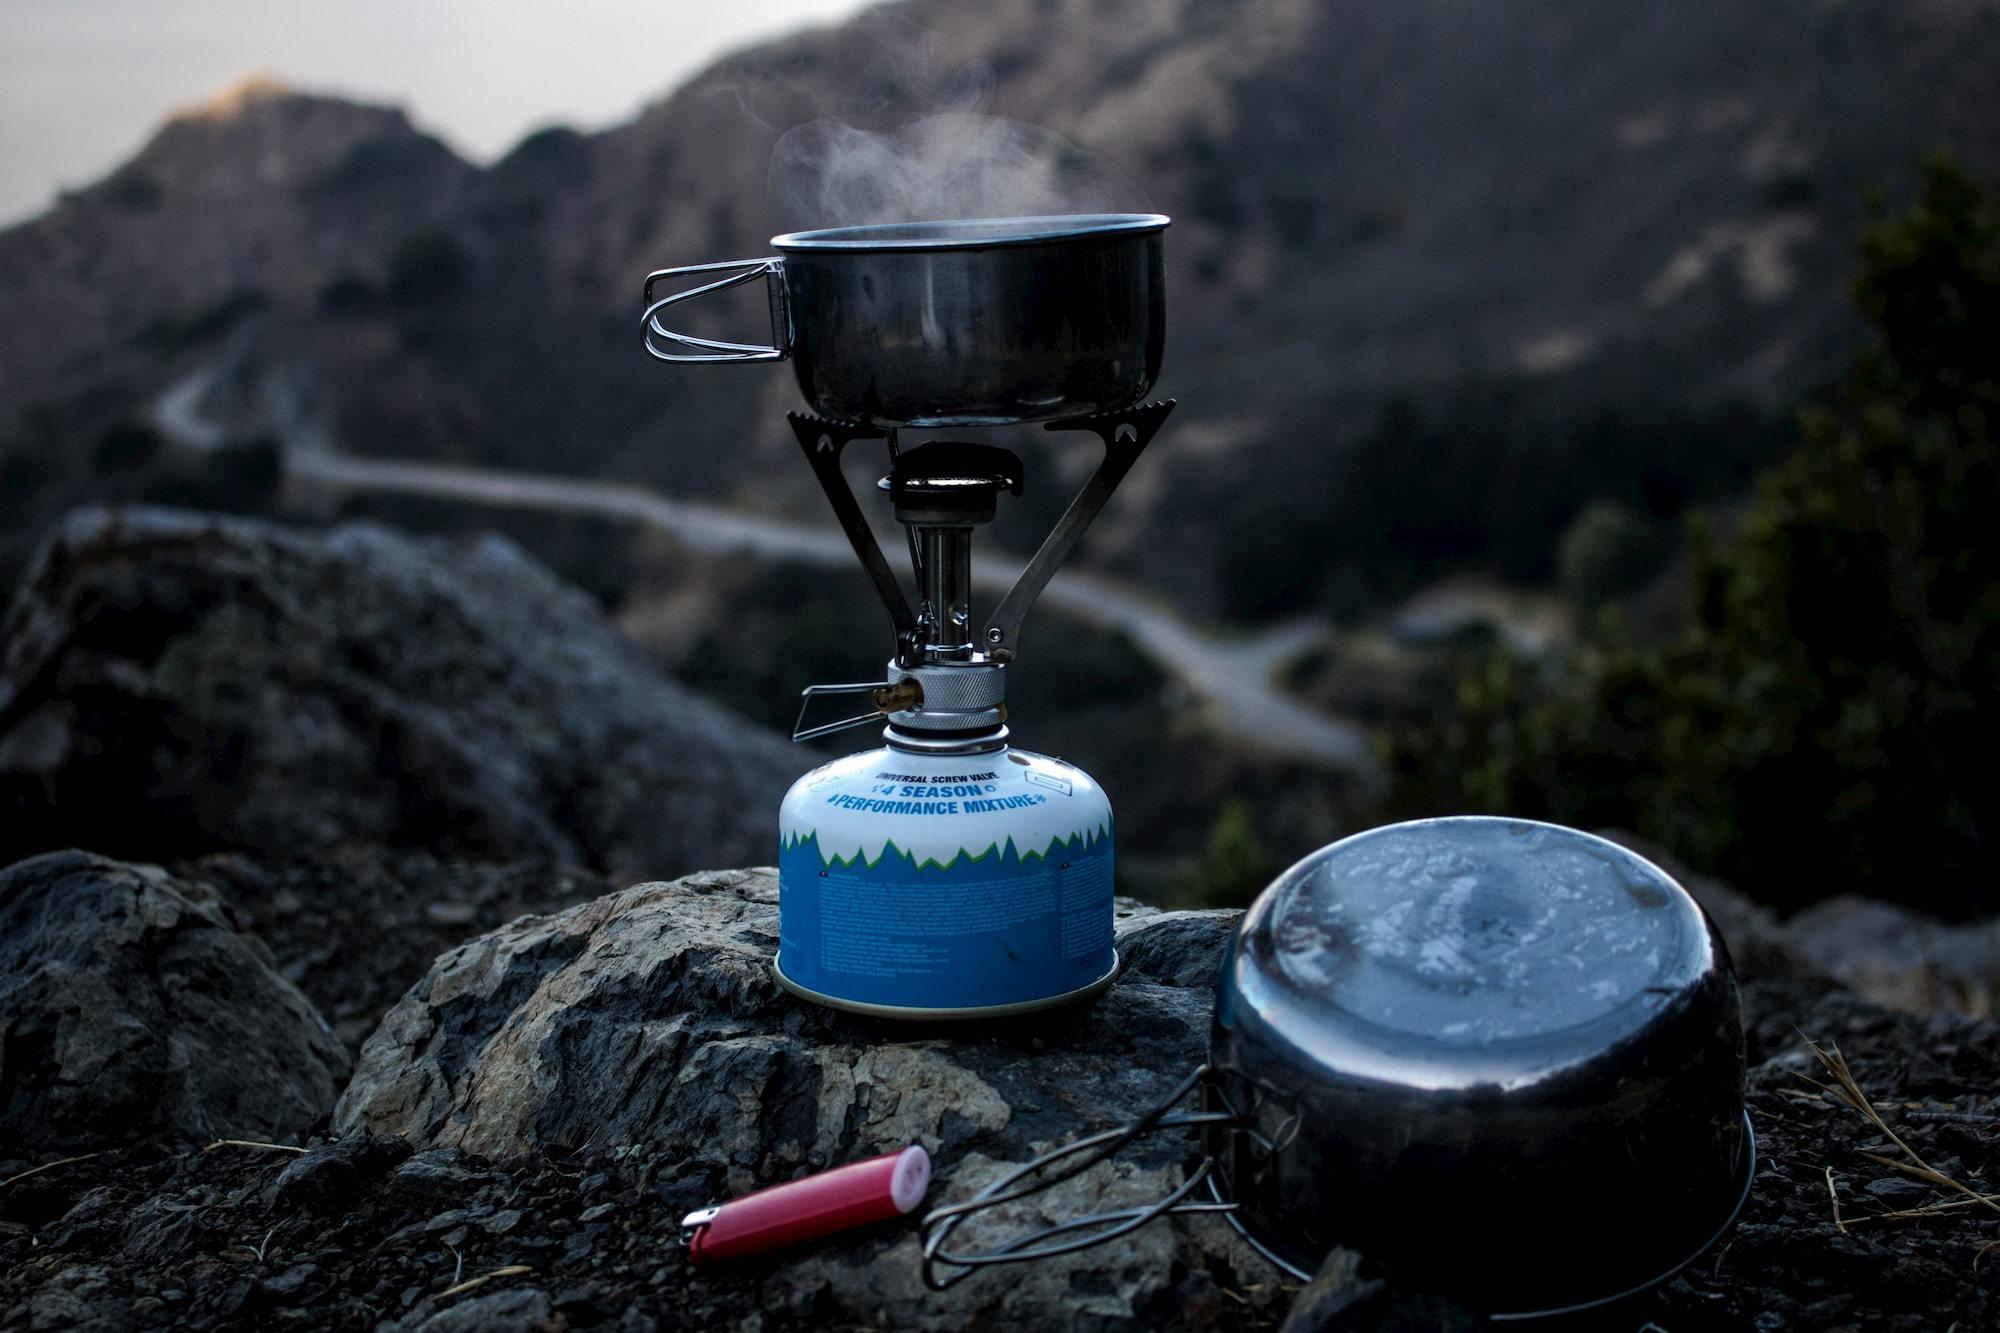 The Dyrt The Best Camping Cooking Gear sage-friedman-N561DZ3NfVM-unsplash-1